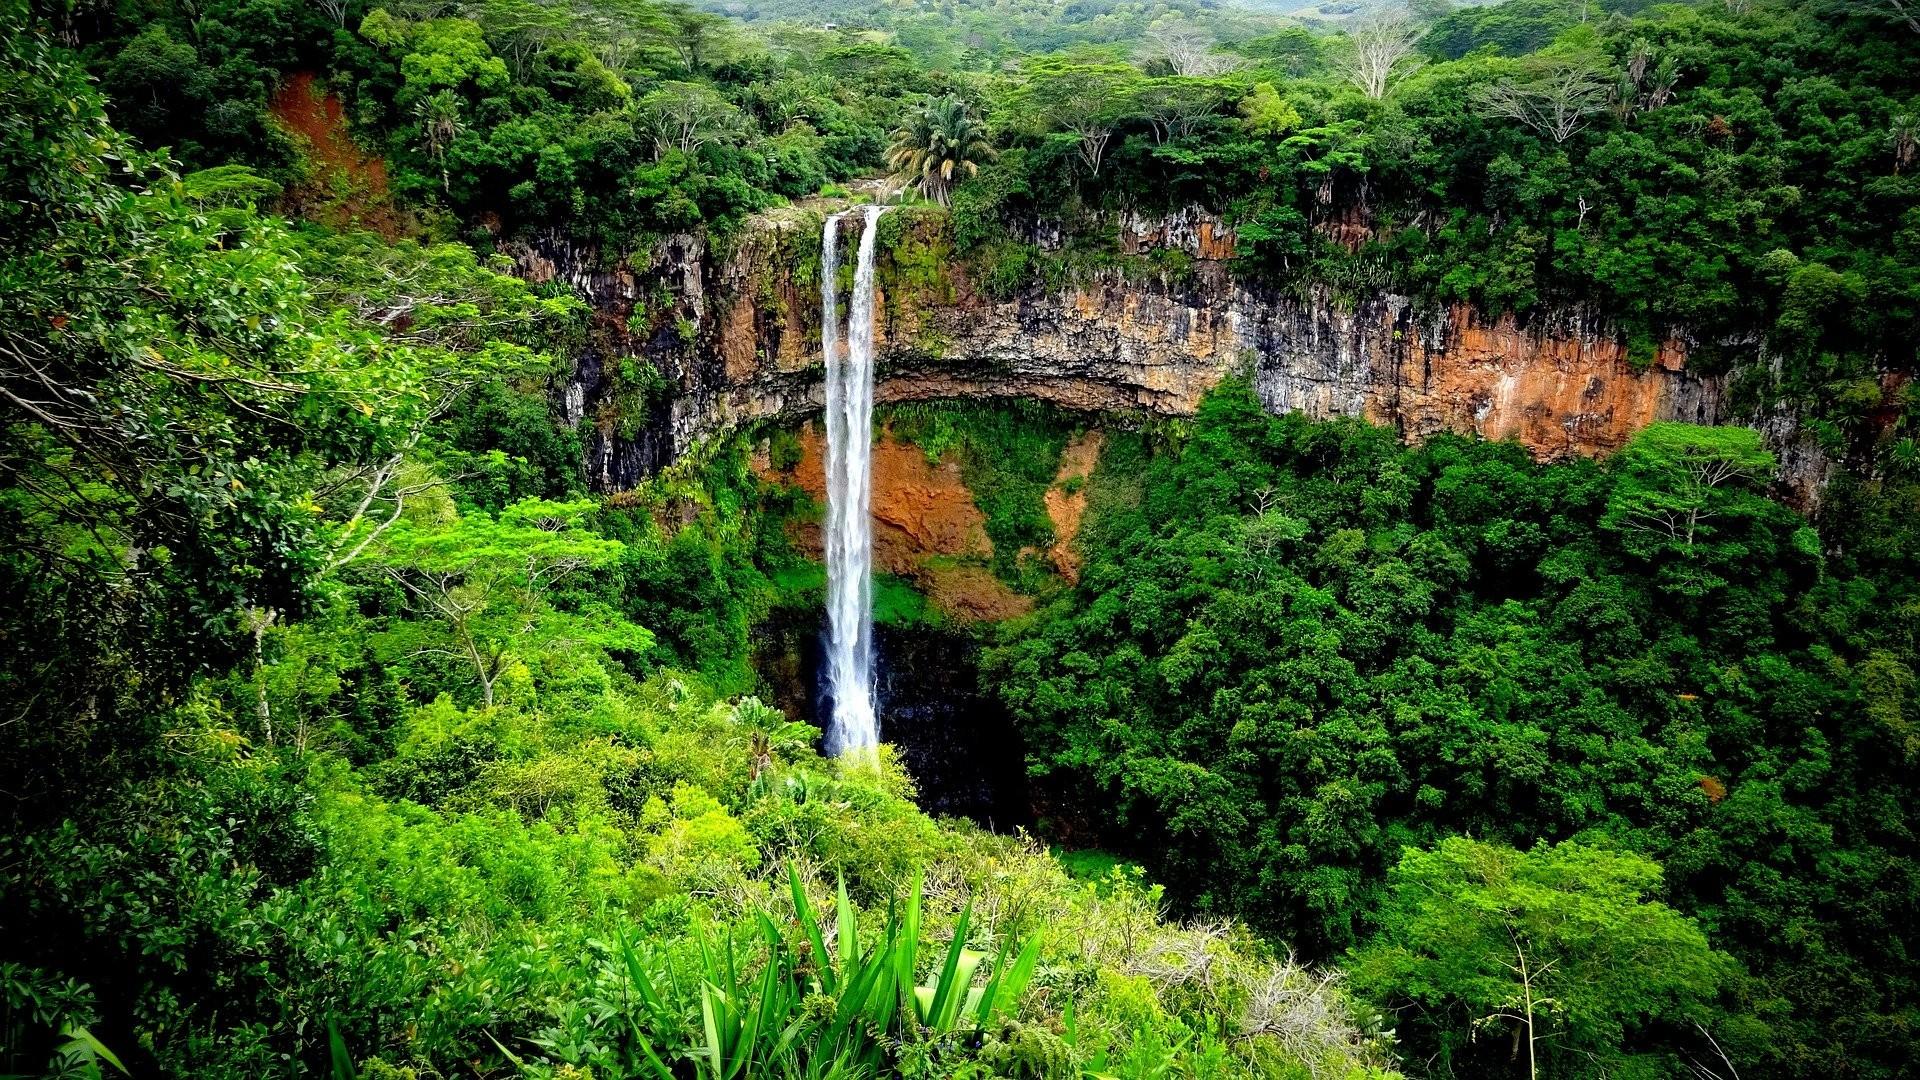 news-main-mauritius-outlines-enhanced-hygiene-protocols-for-tourism-sector.1592400552.jpg